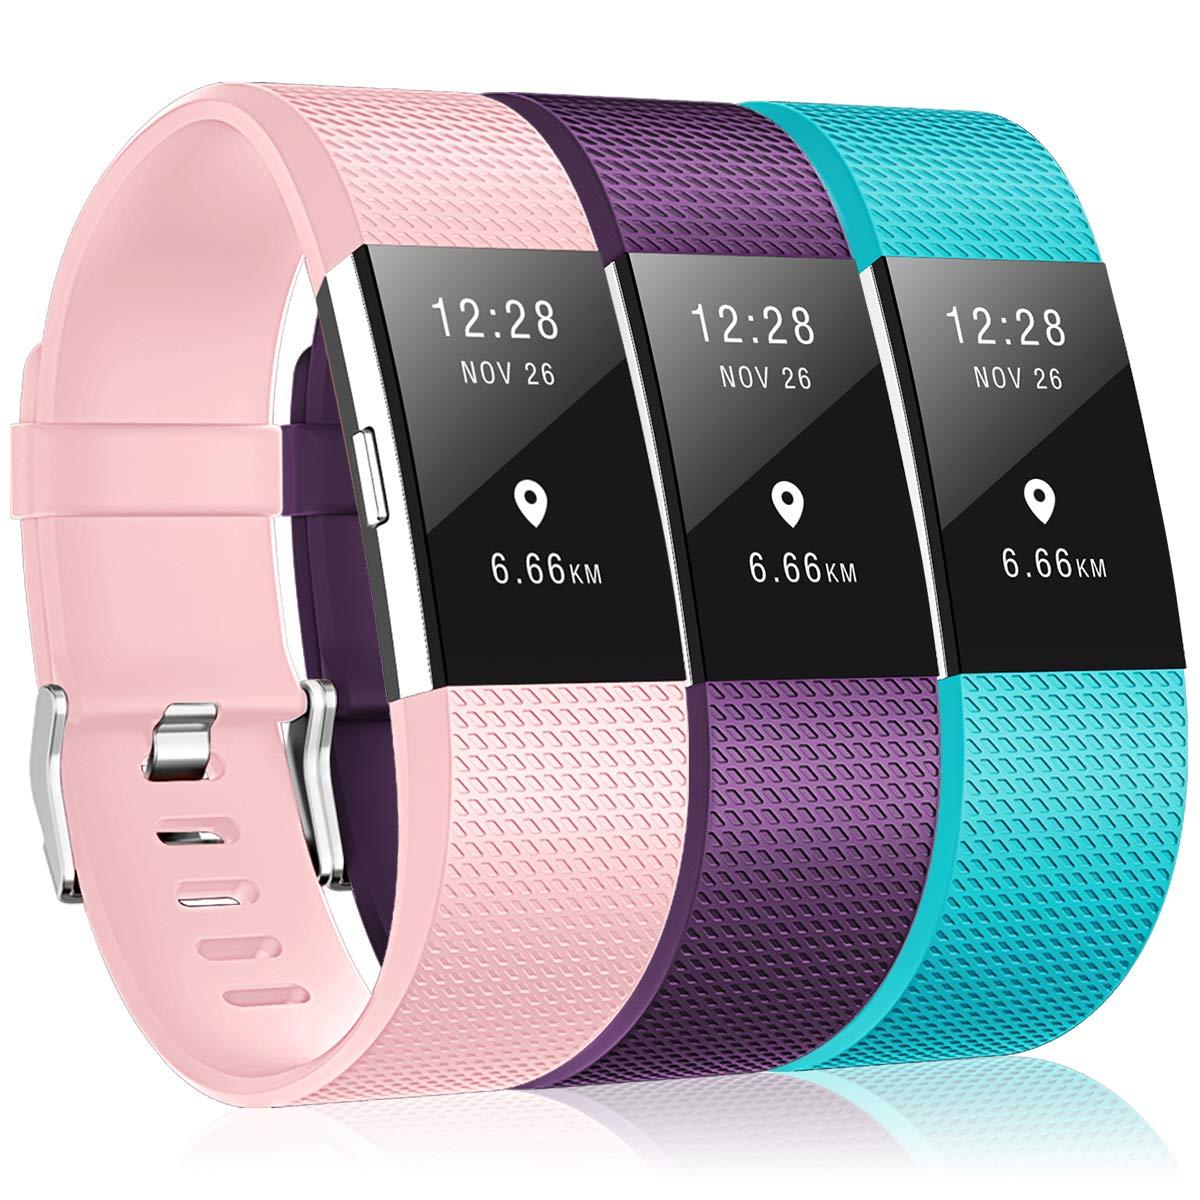 Bracelet Fitbit Charge2, bracelet de remplacement multicolore pour Fitbit Charge2 Bracelet Fitbit Charge2 DigiHero APL160019